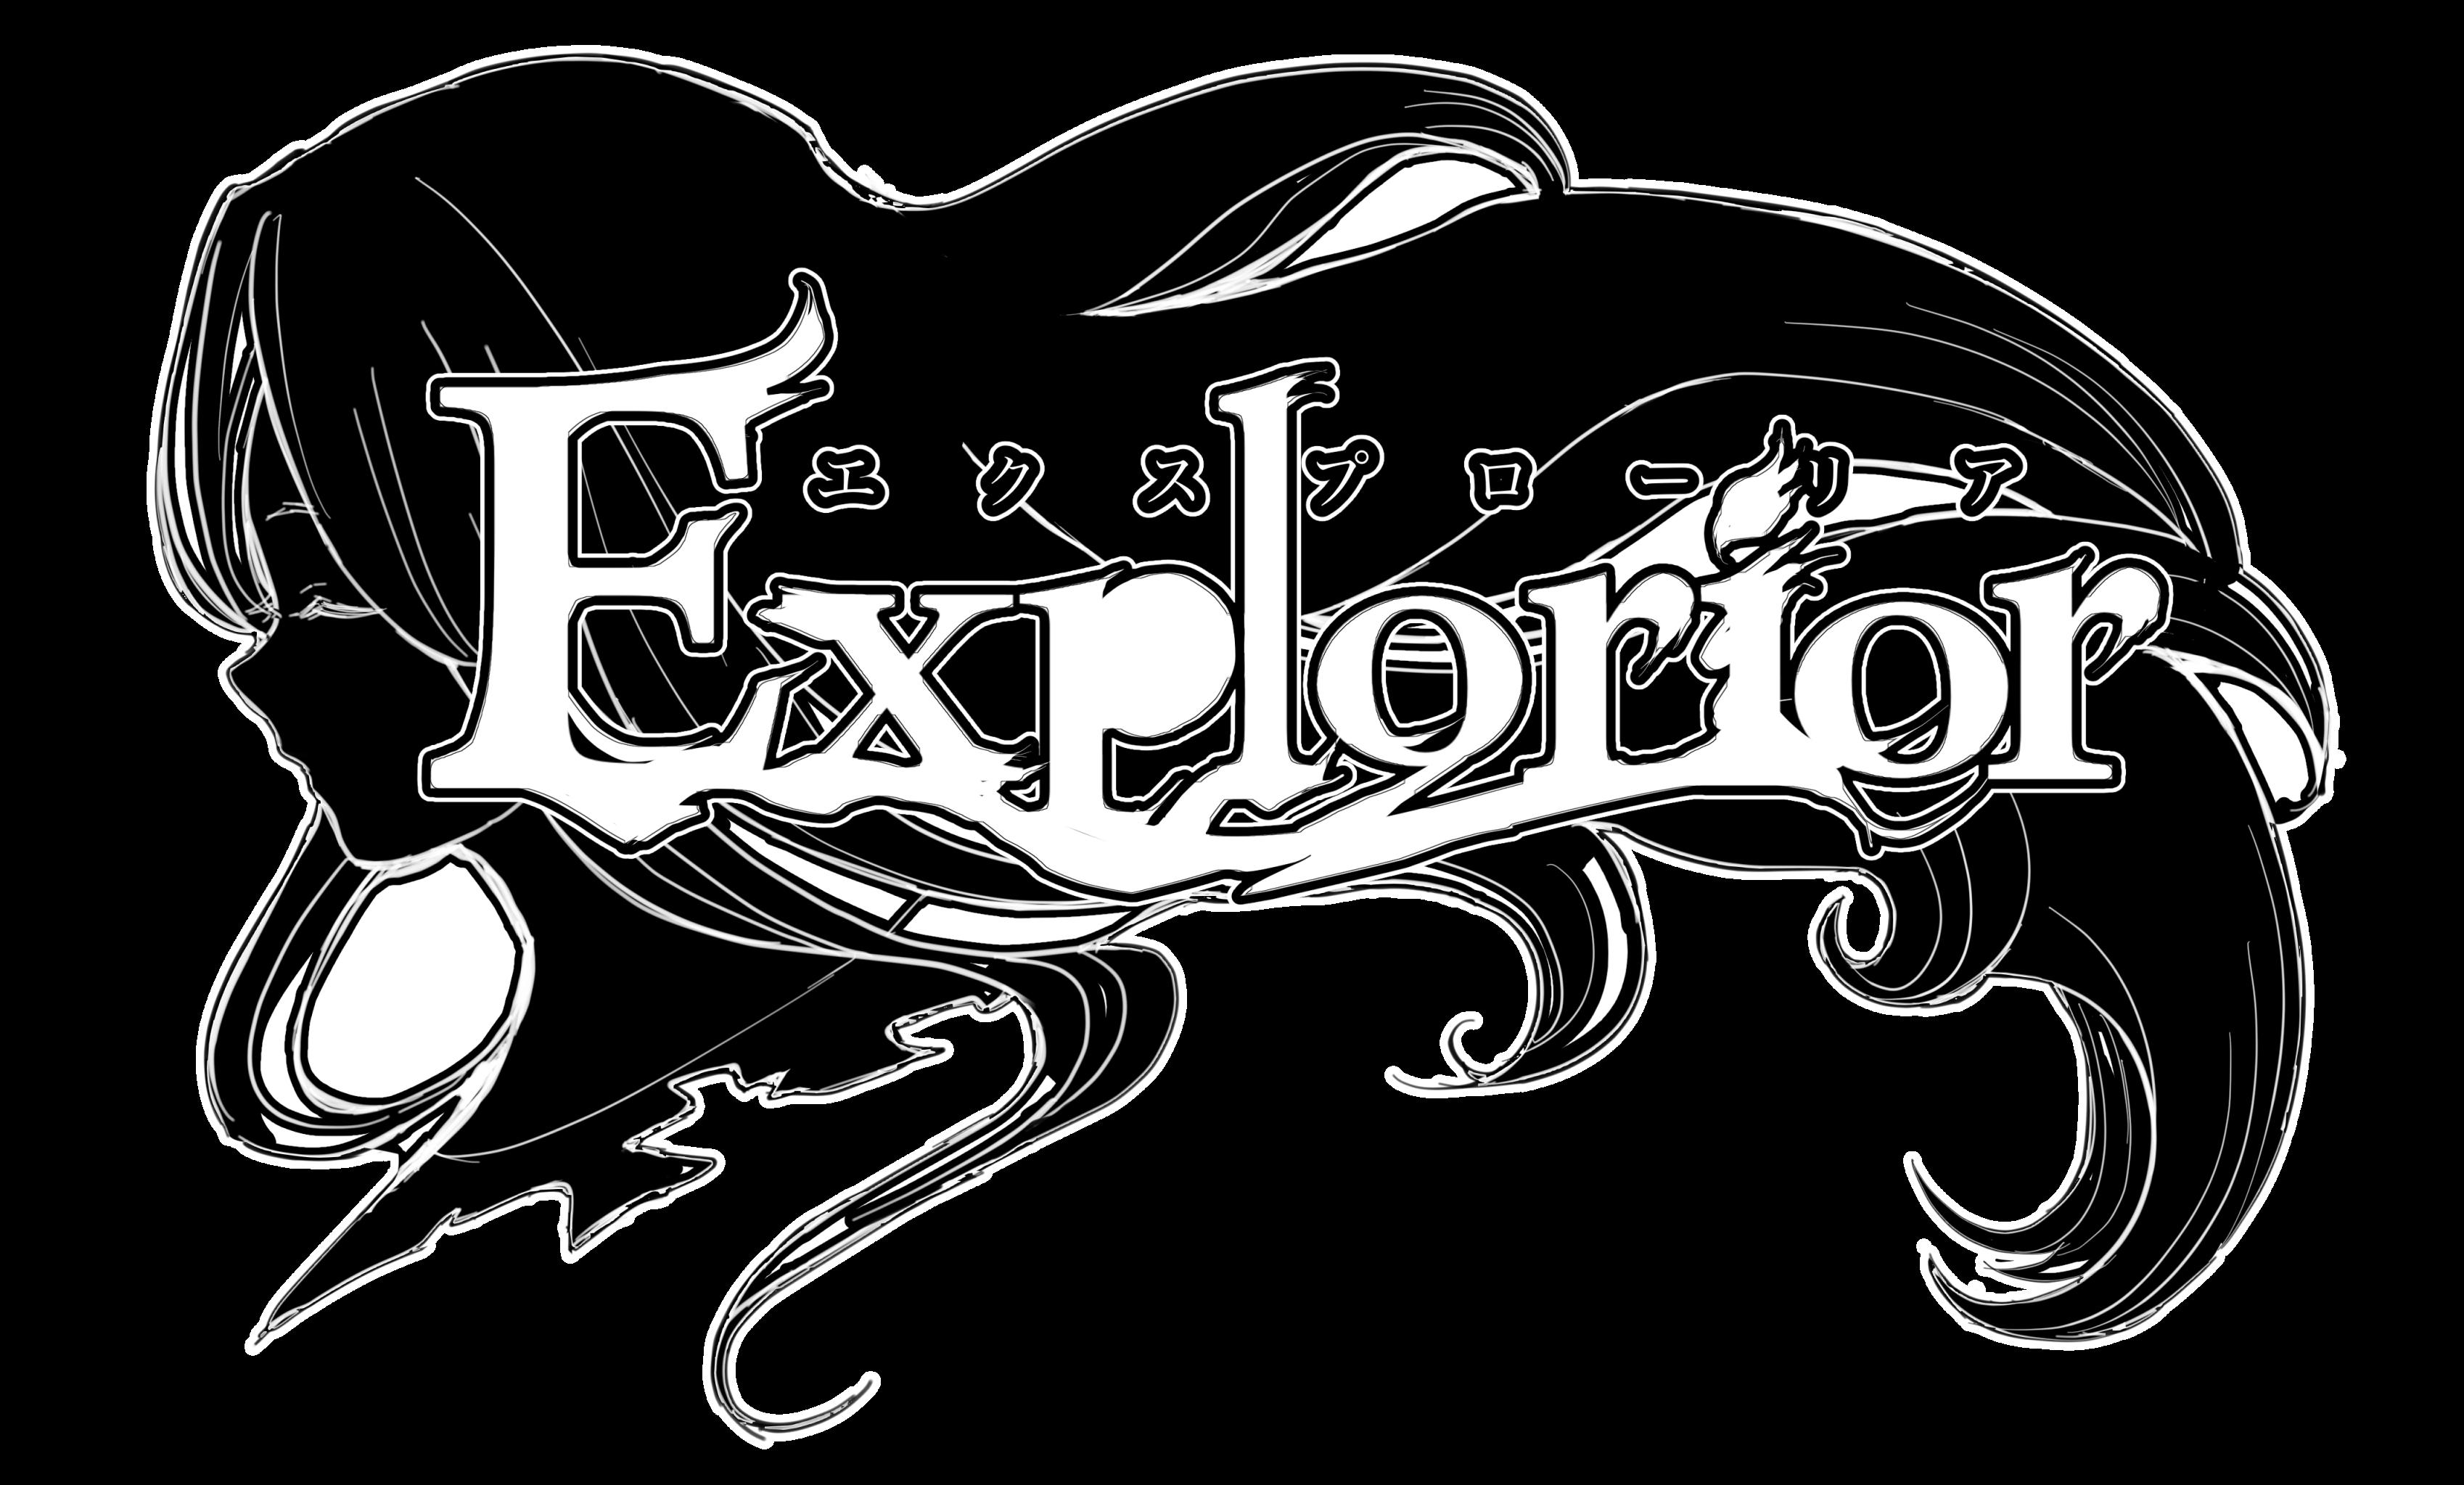 Explorior